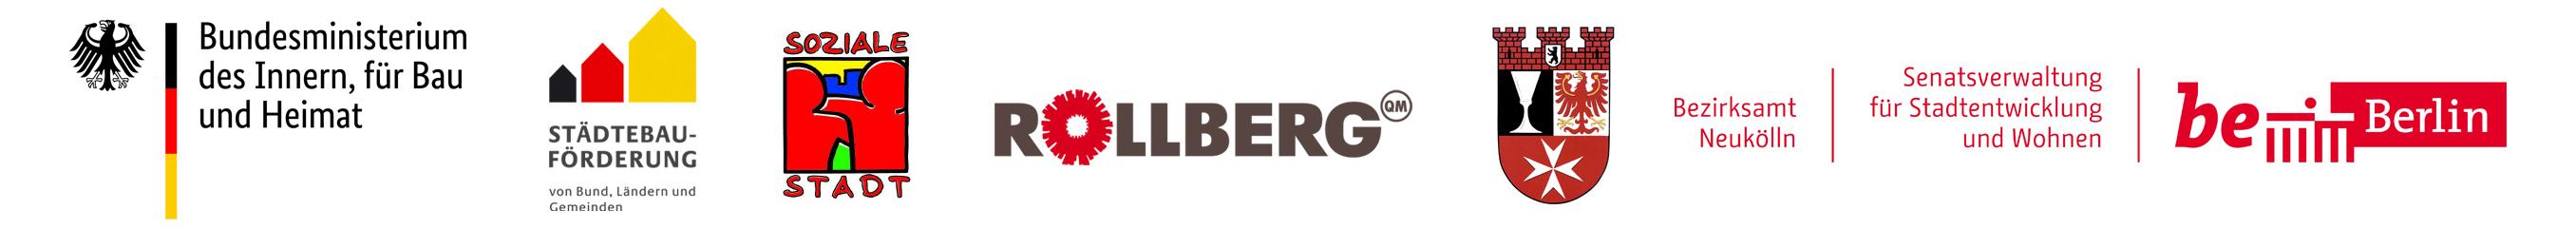 logoleiste aktions projektfonds rollberg2018